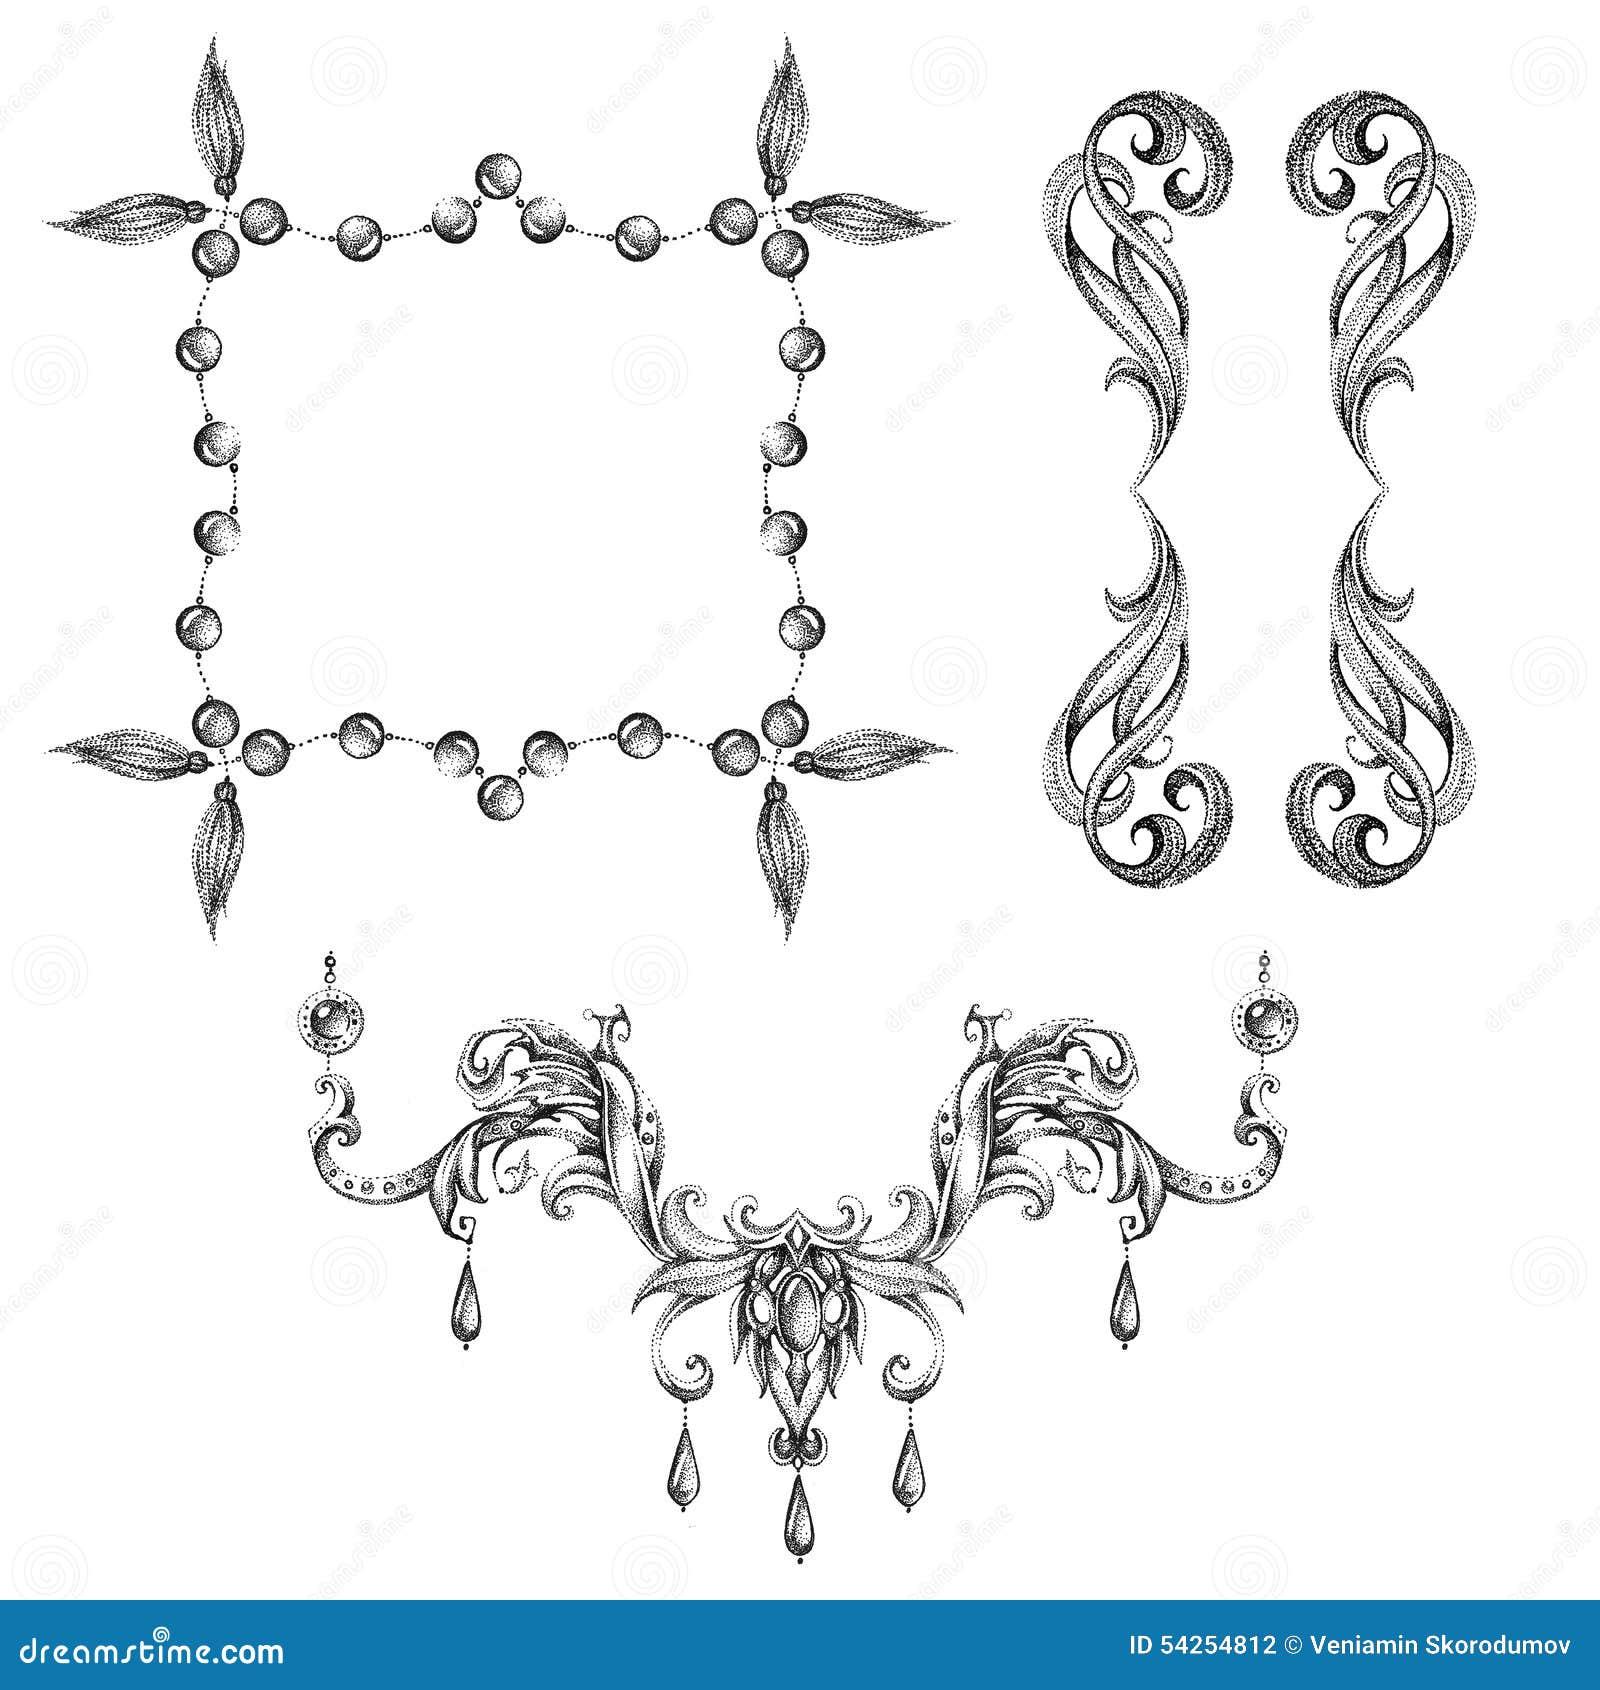 A Set Of Decorative Frames And Design Elements, Floral Ornaments ...